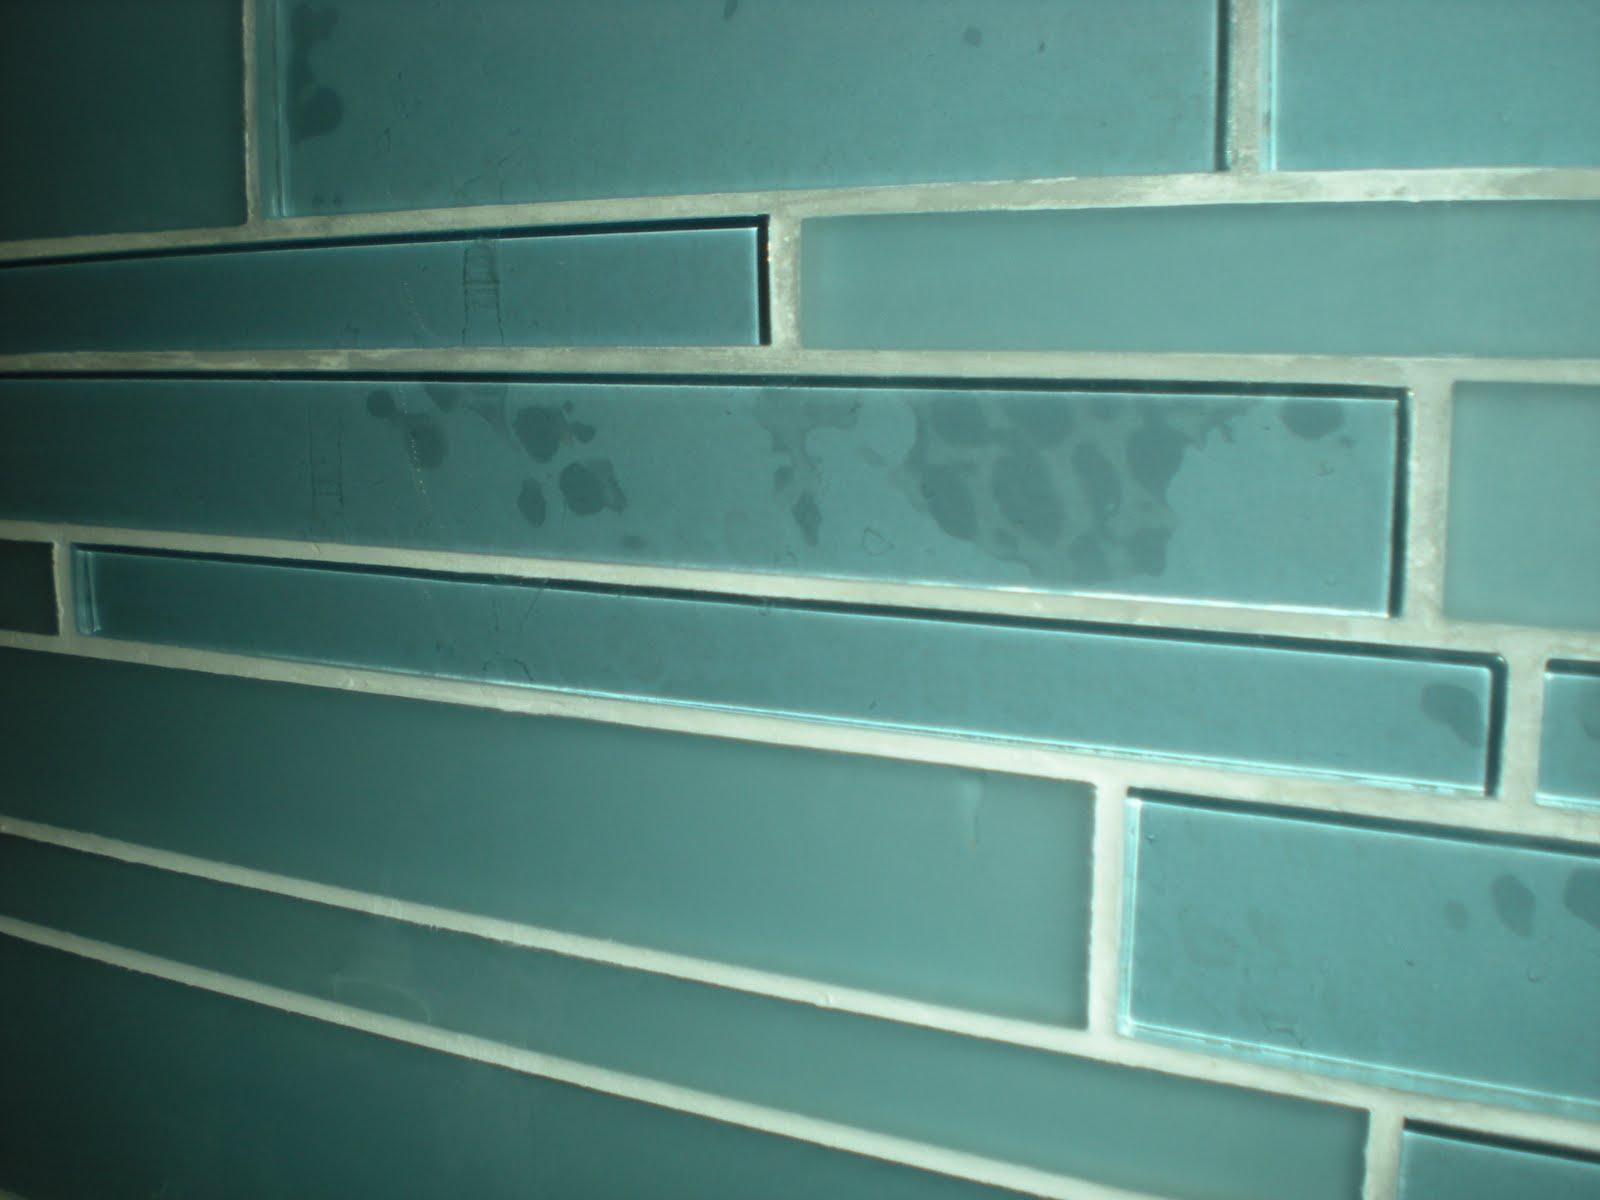 FJ Smith Contracting Corp.: Glass Tiled Bathroom